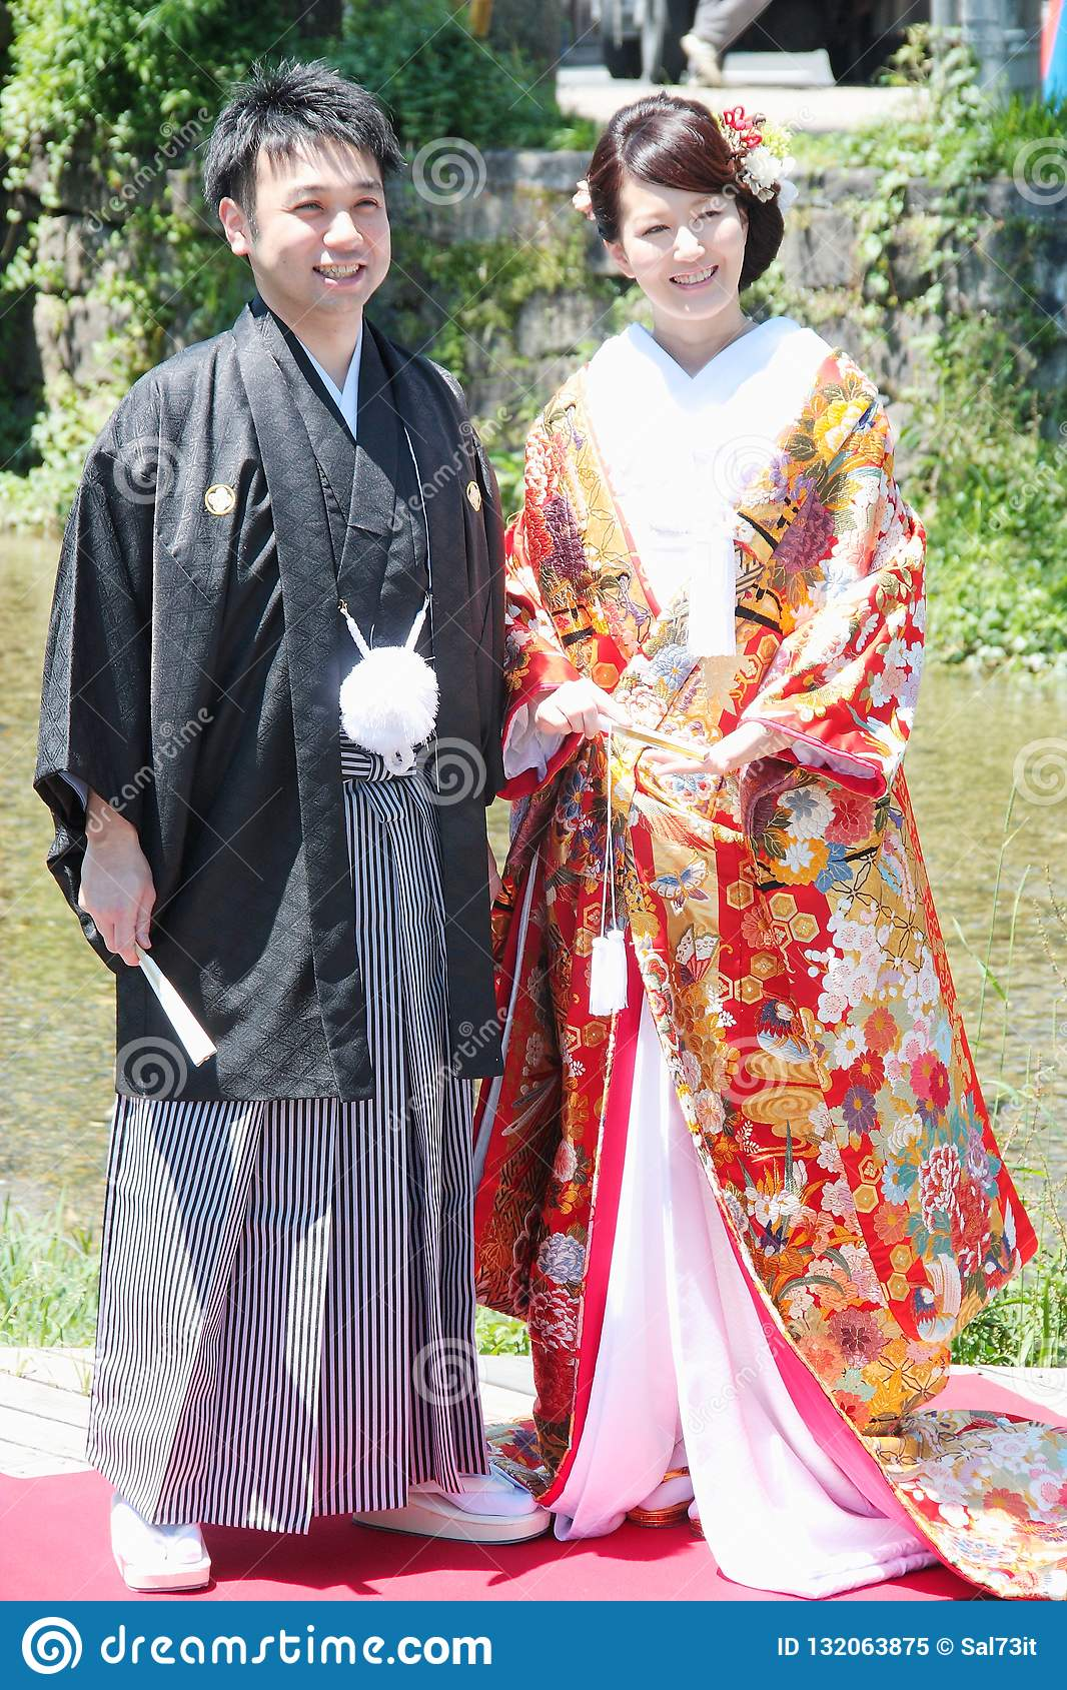 Beautiful bride and groom wearing traditional japanese wedding dress in Kyoto Japan.